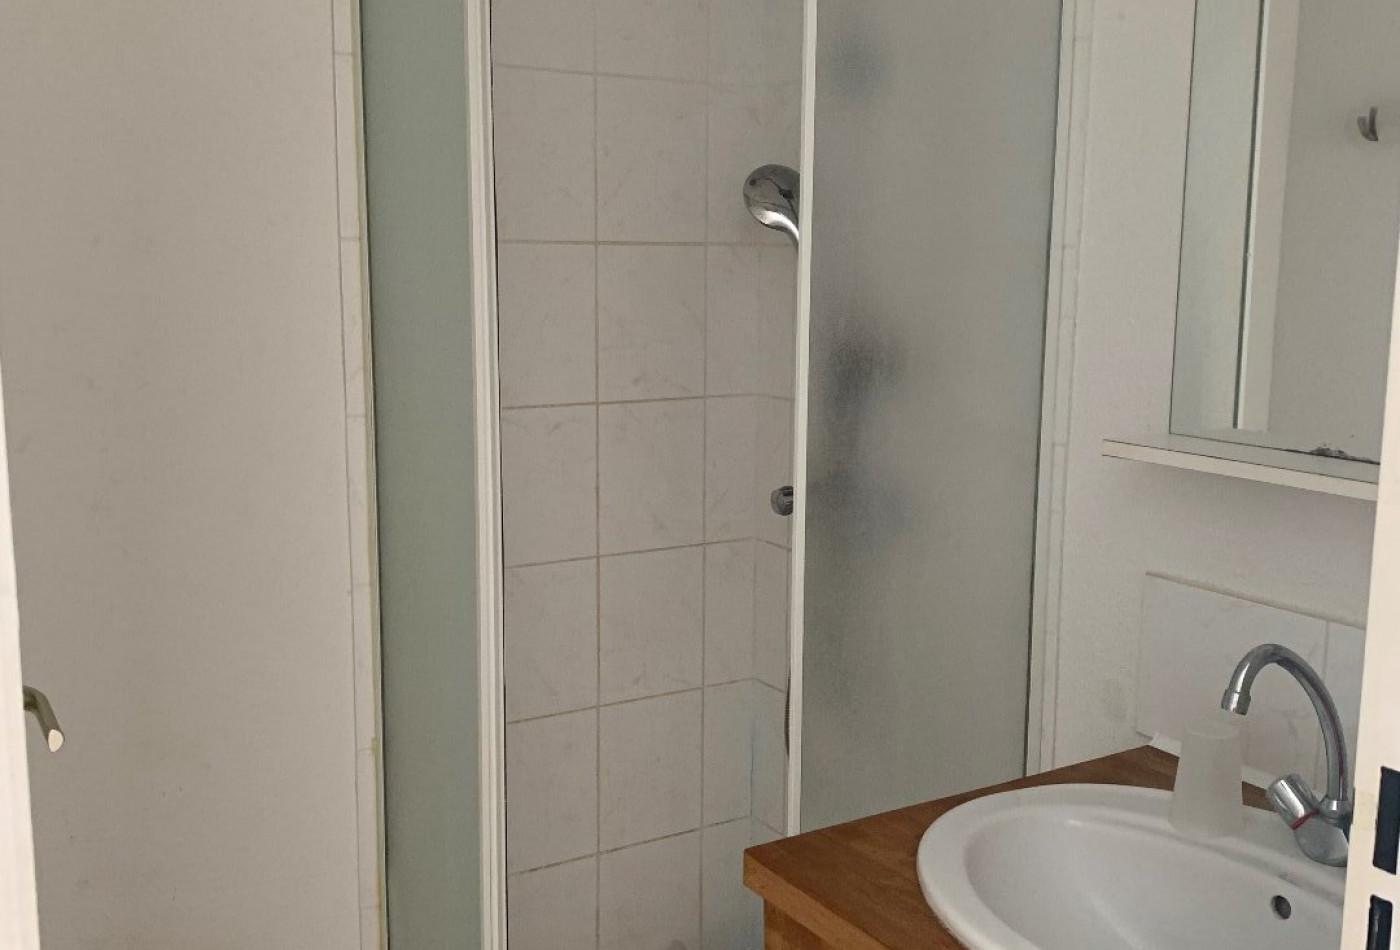 A vendre  Valras Plage   Réf 342042574 - Cabinet barthes